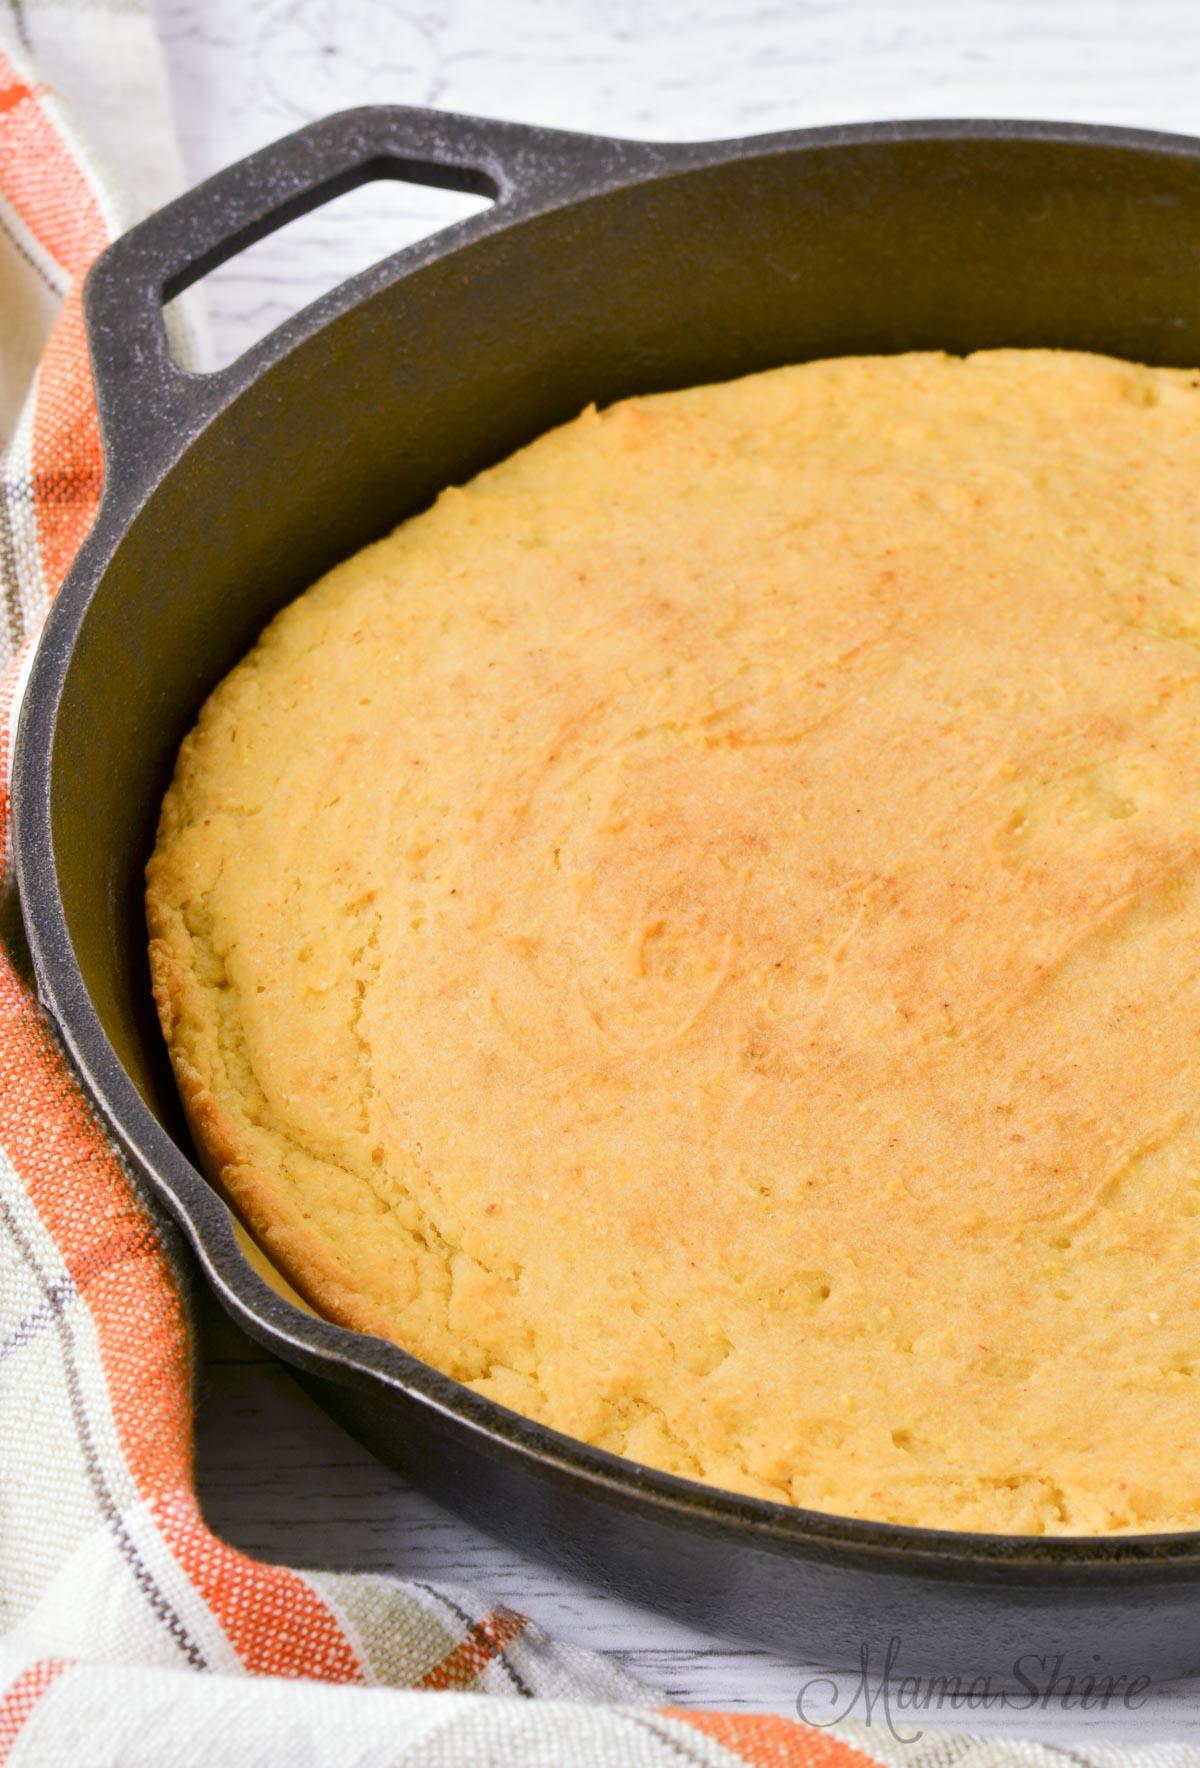 Gluten-Free Cornbread baked in a cast iron skillet.